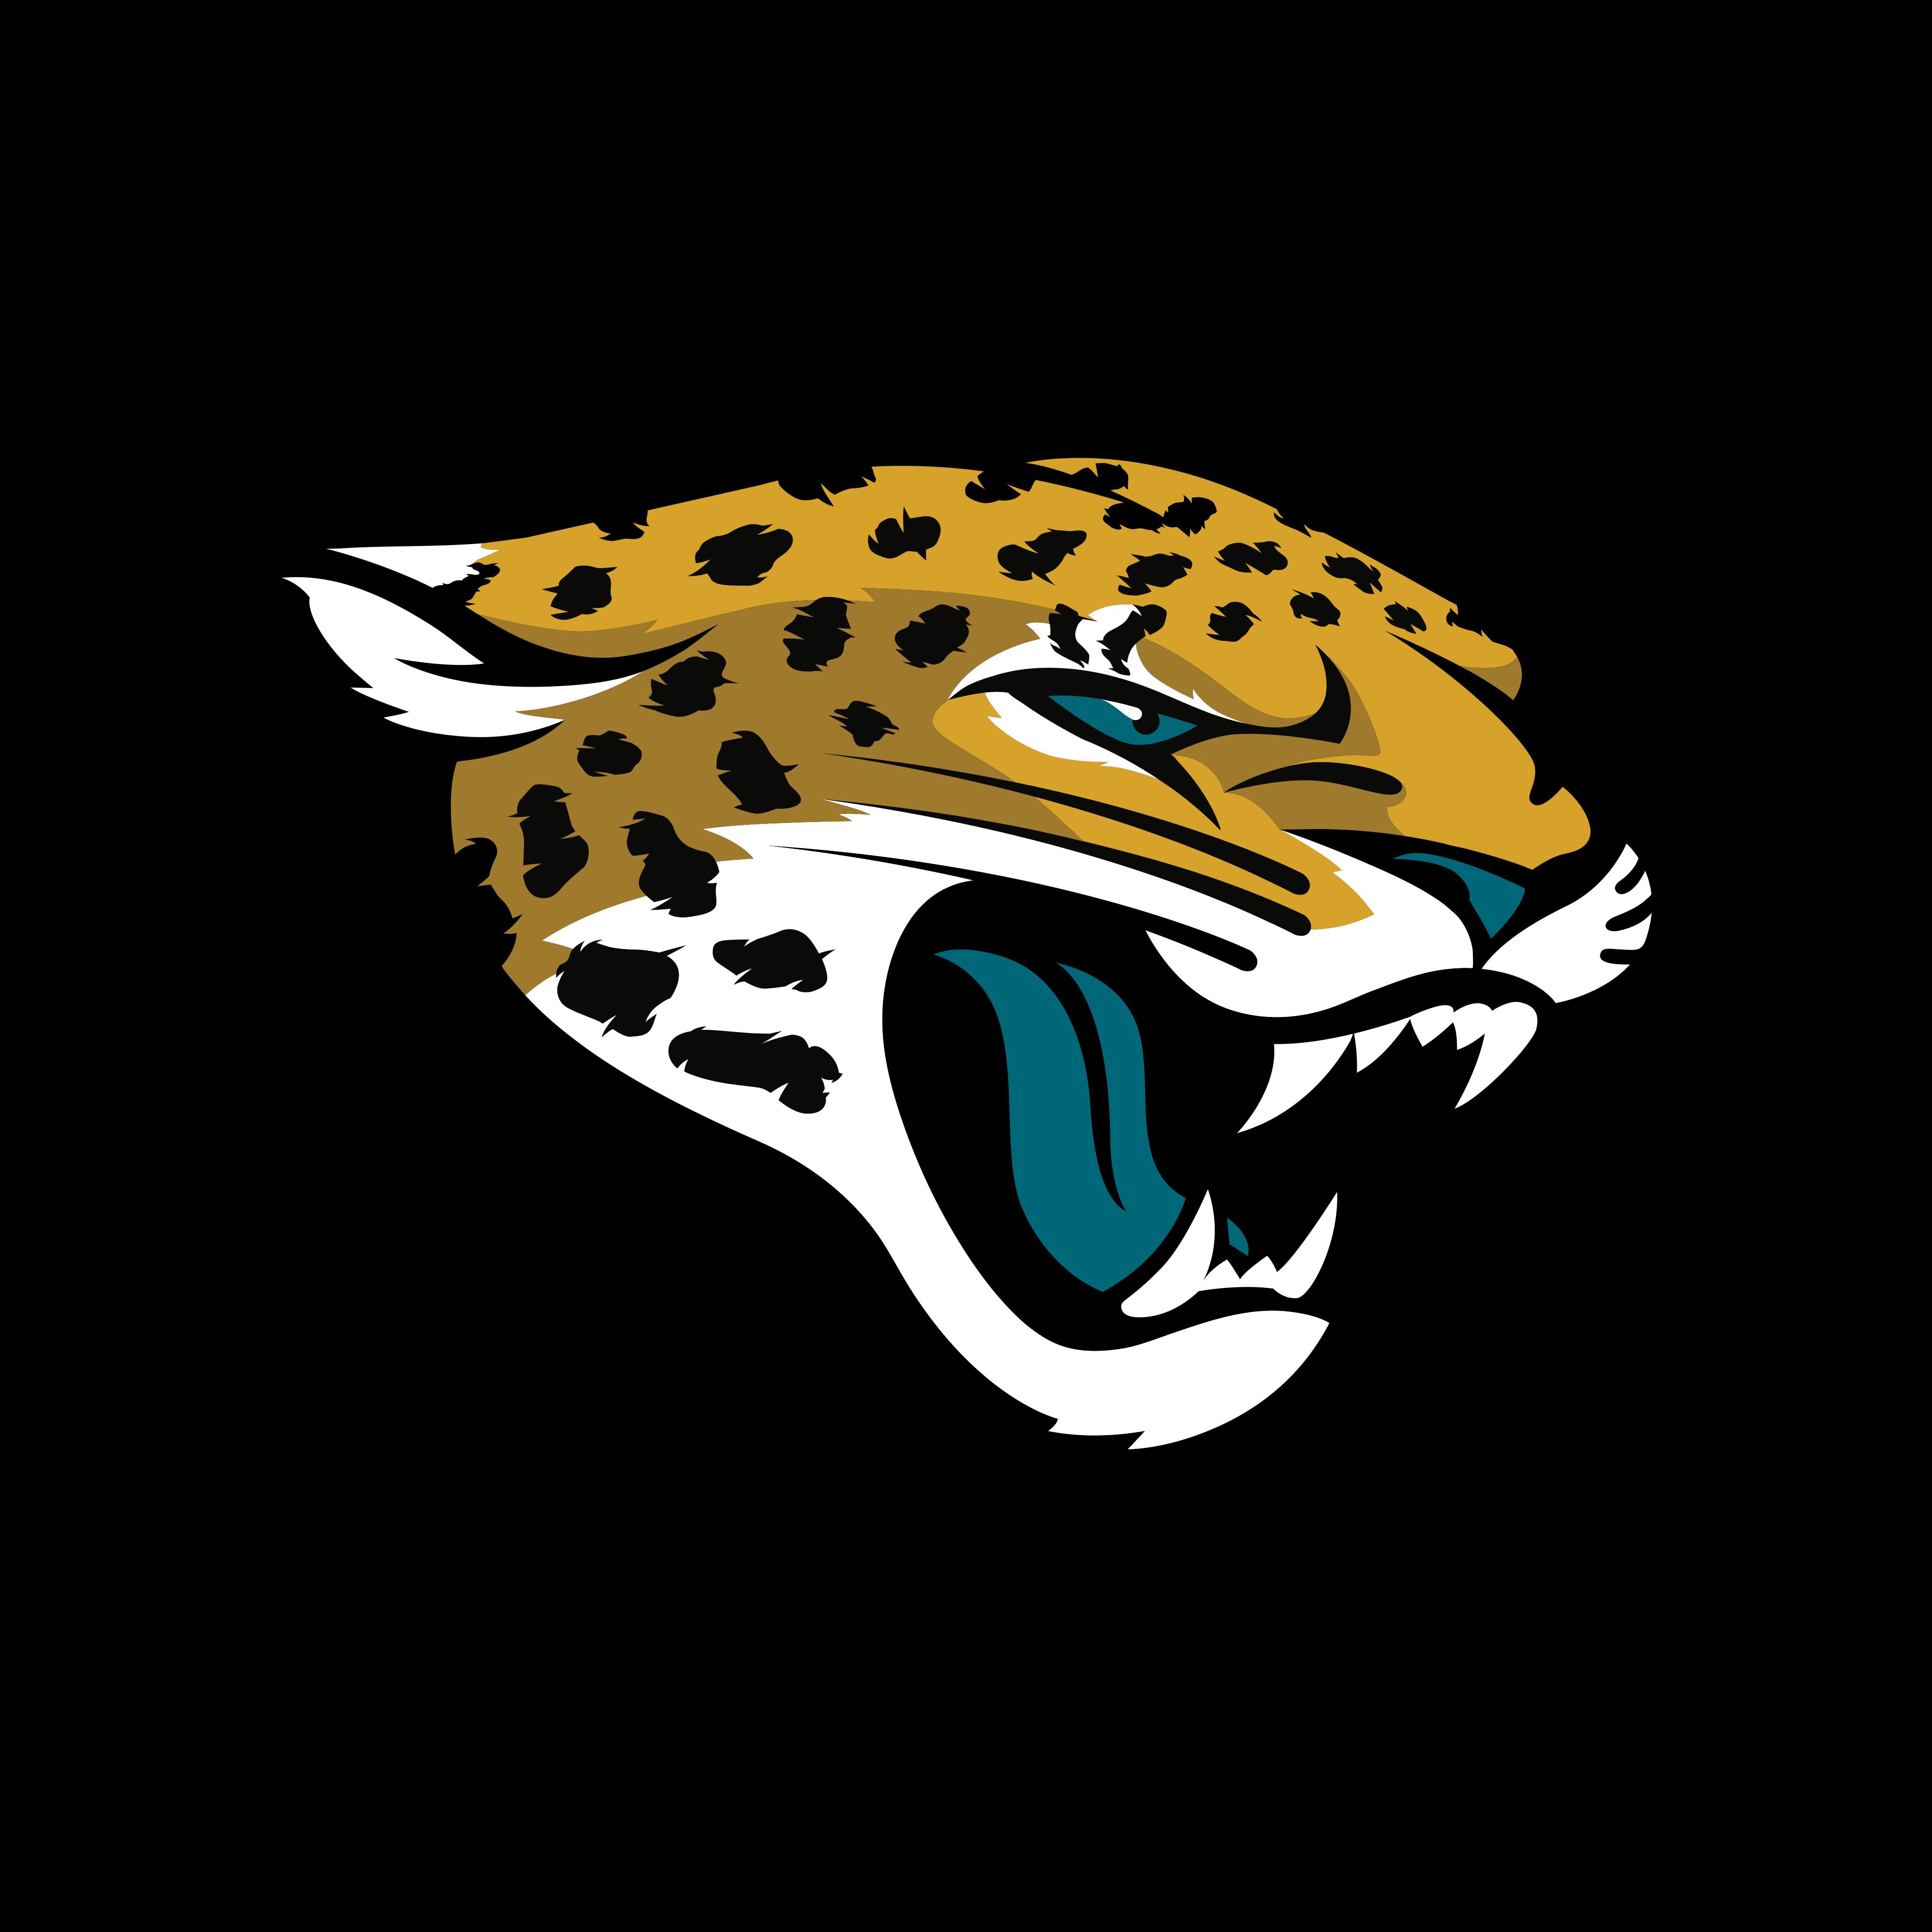 jacksonville jaguars logo 0 - Jacksonville Jaguars Logo